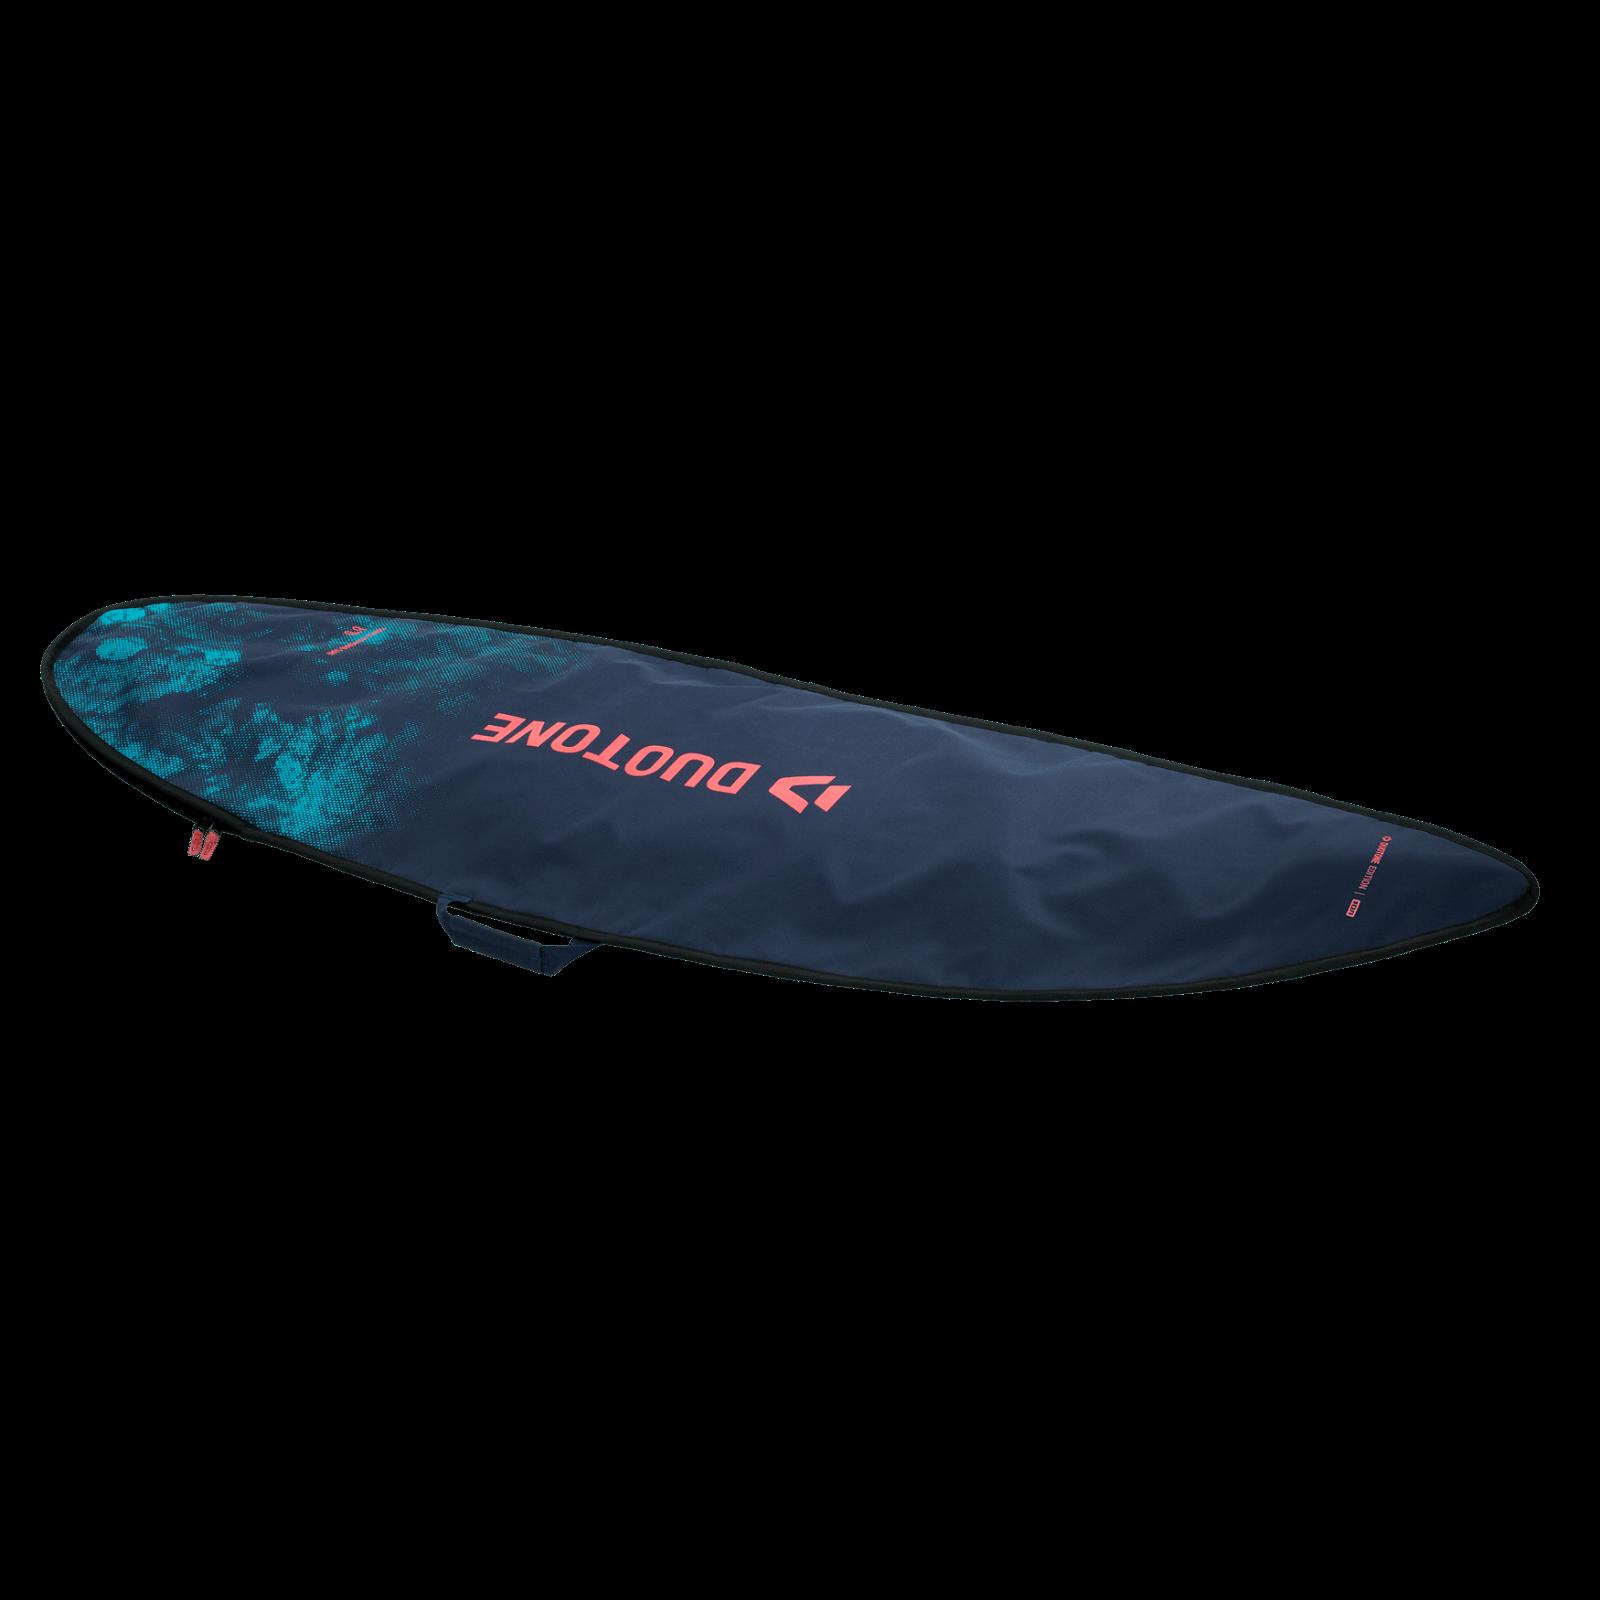 Single Boardbag Surf 2019